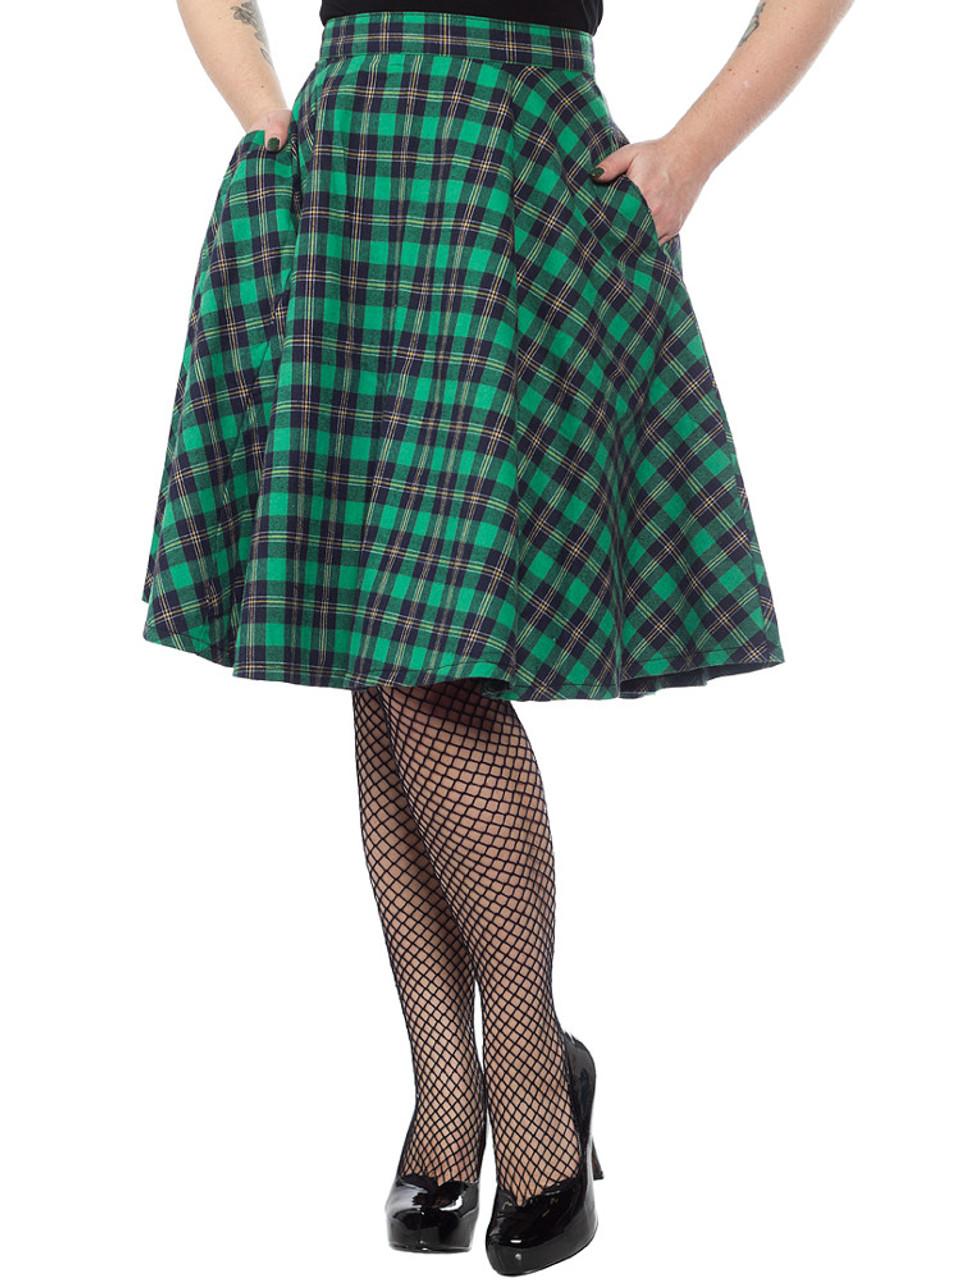 bbf61d7ae Sourpuss Bonnie Green Plaid Skirt - Suicide Glam Australia